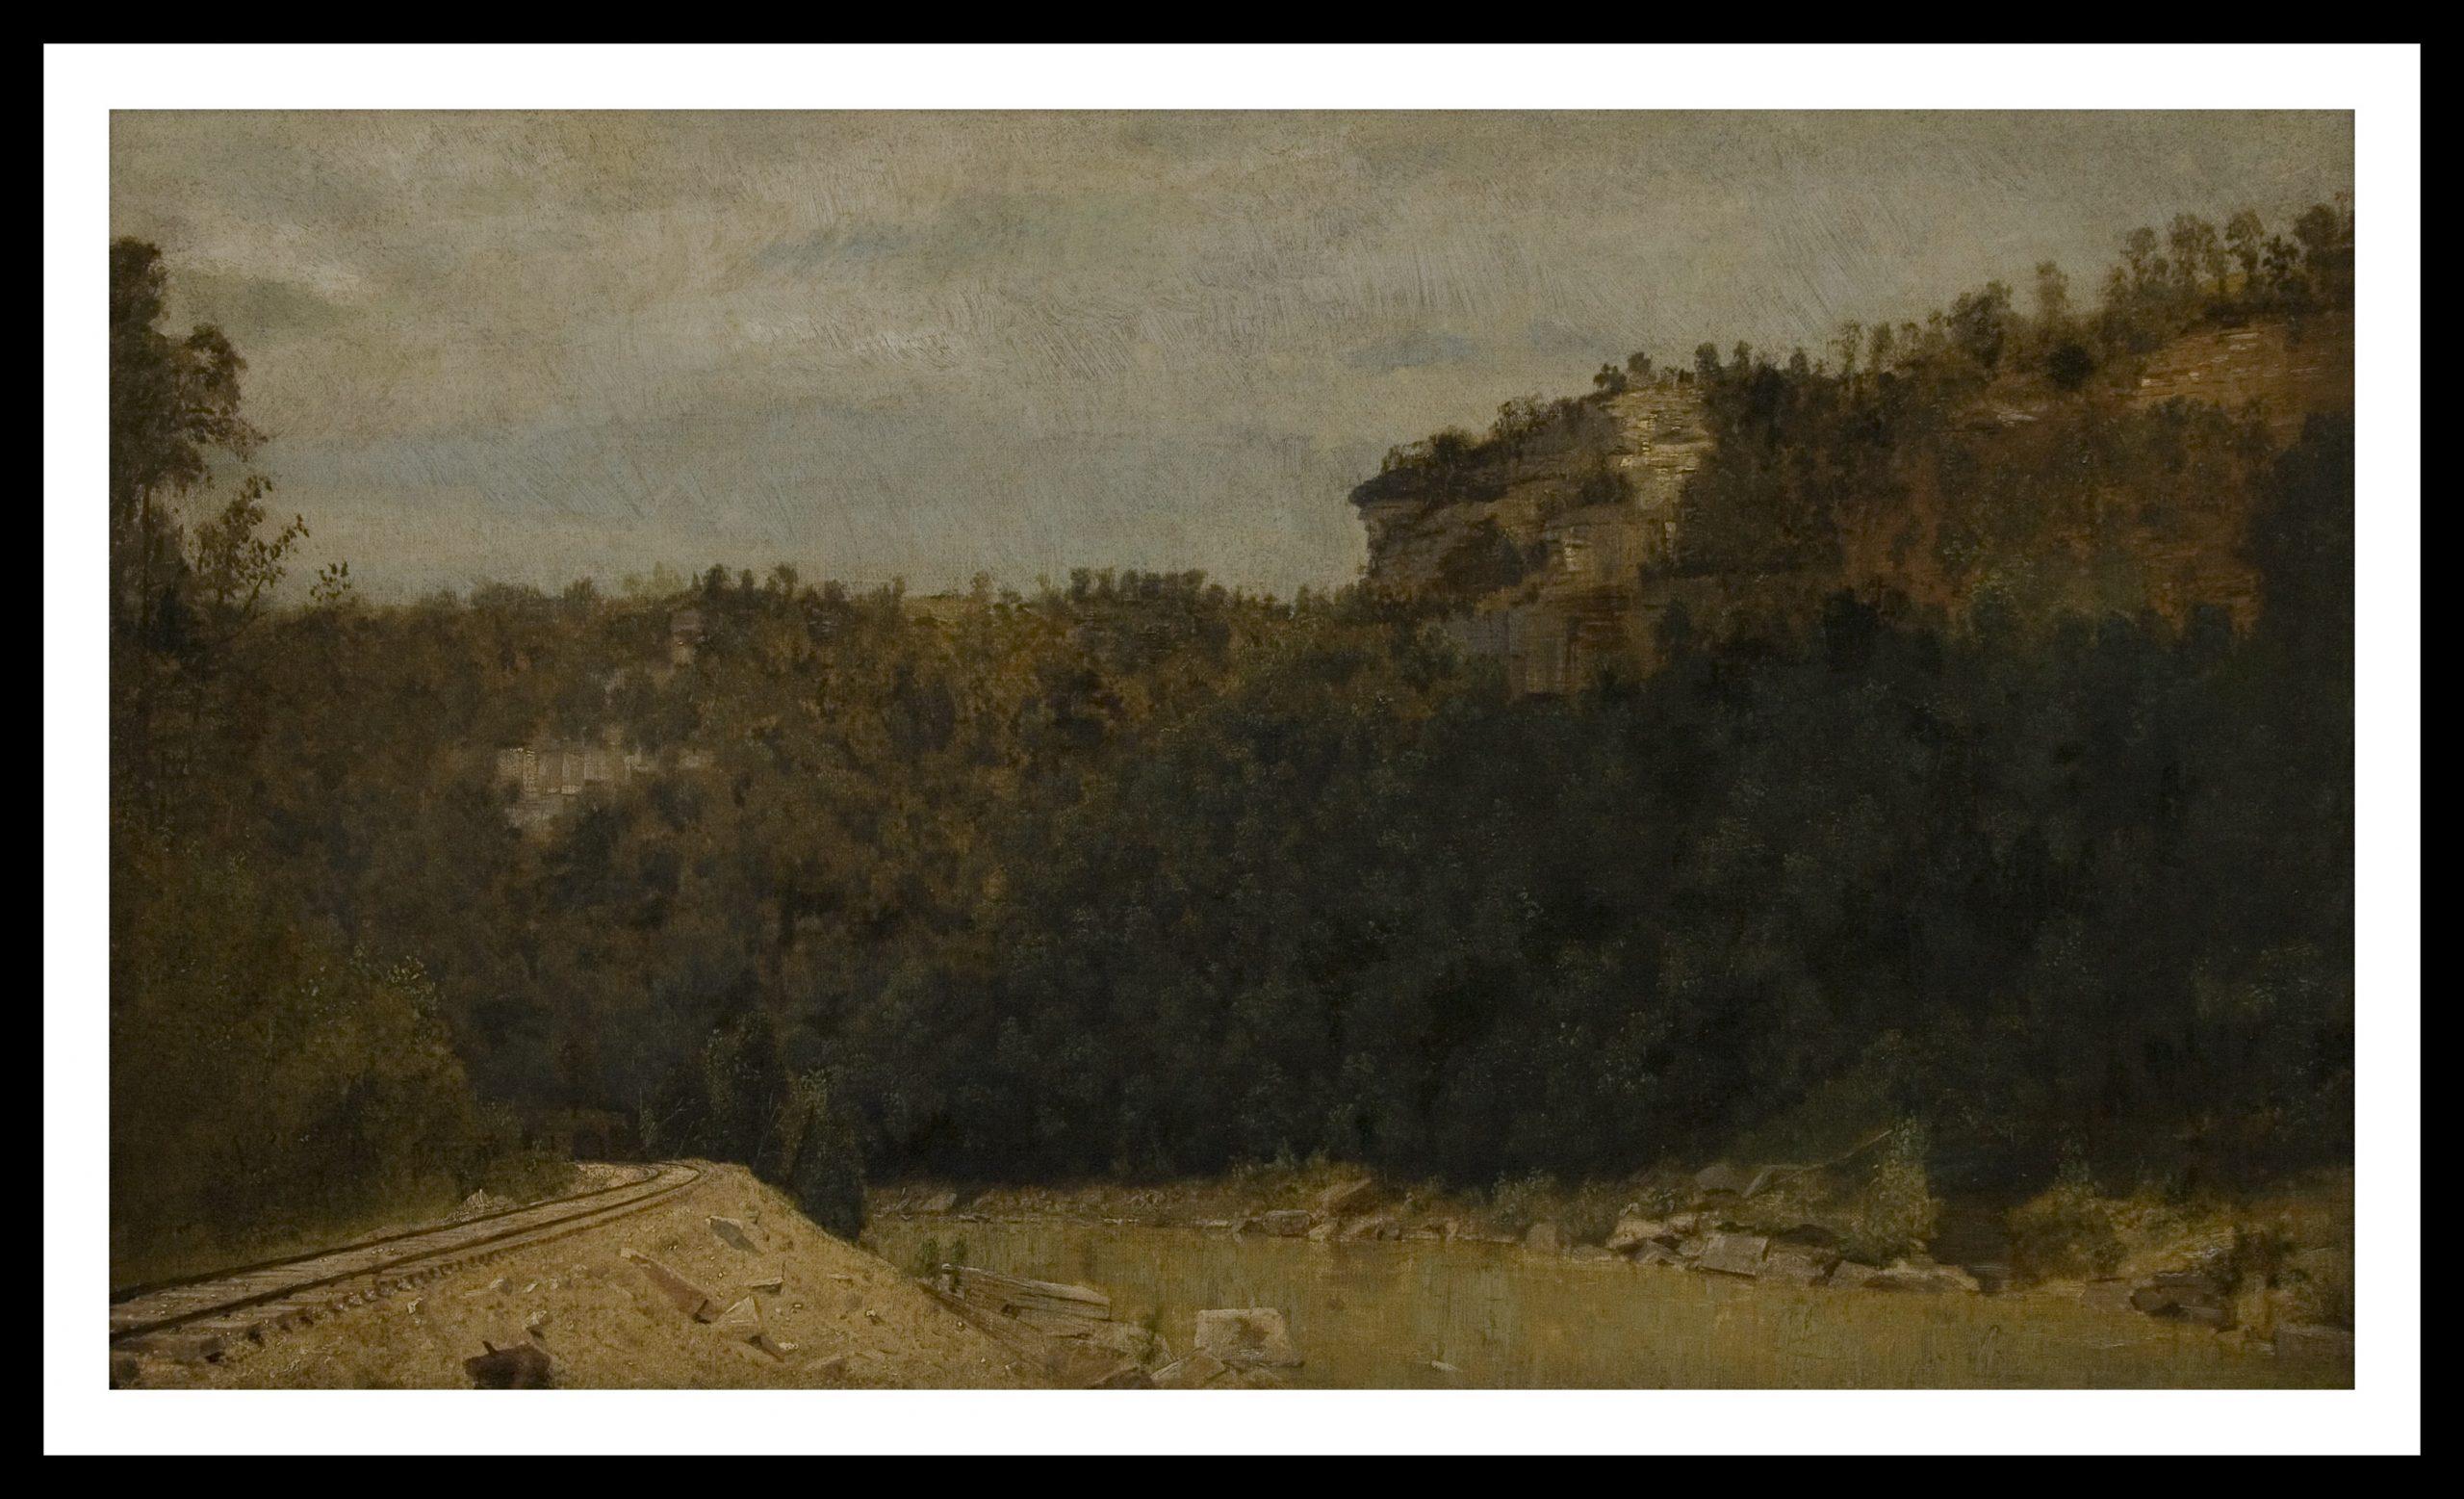 Thomas Pollock Anshutz, Untitled [Mountain Landscape with Railroad Tracks] (c. 1885-1890)